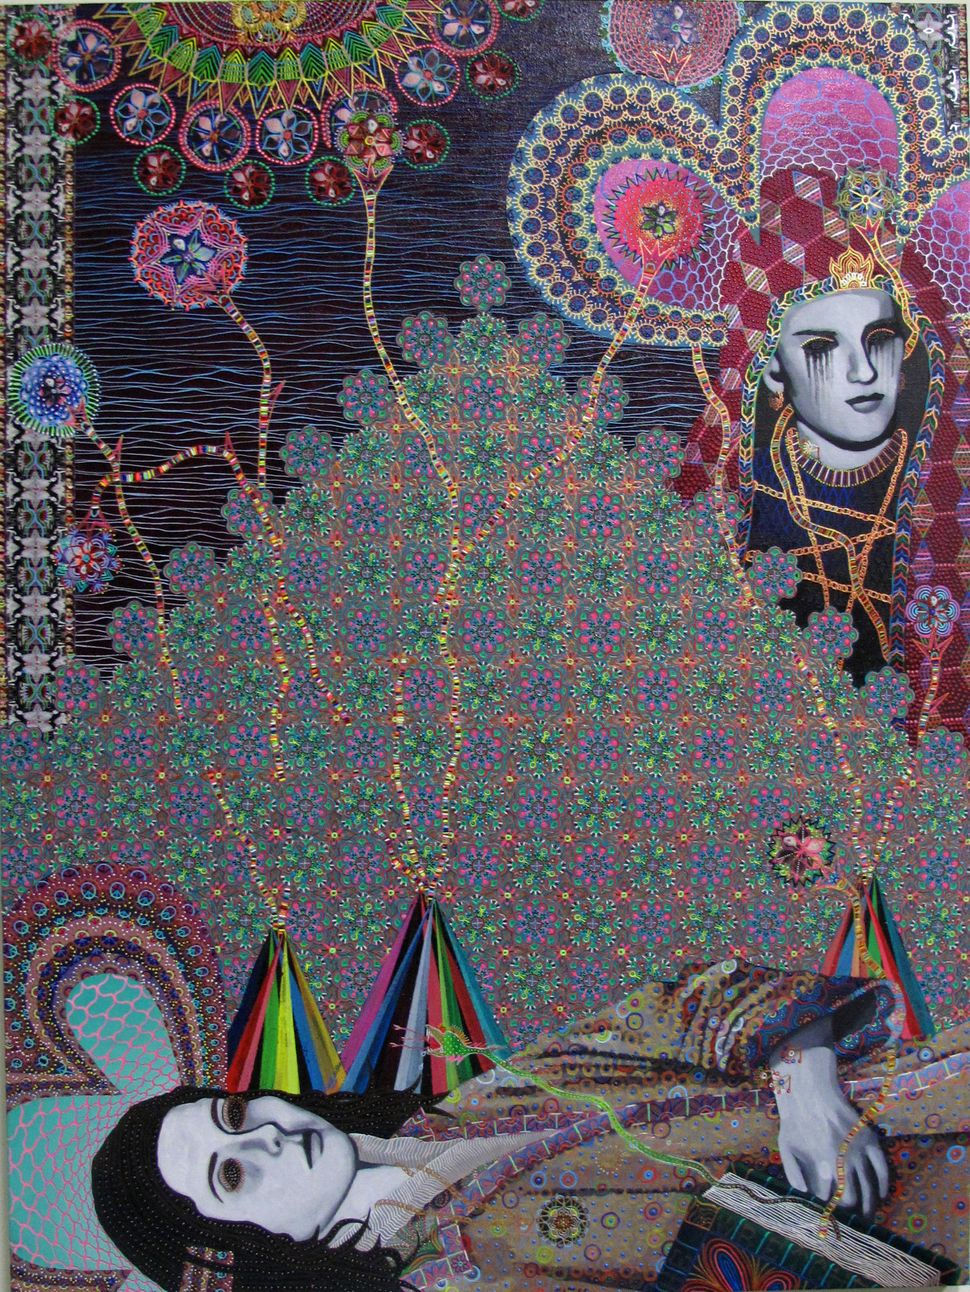 Les Femmes D Alger #37, 48x36 inches, 2014